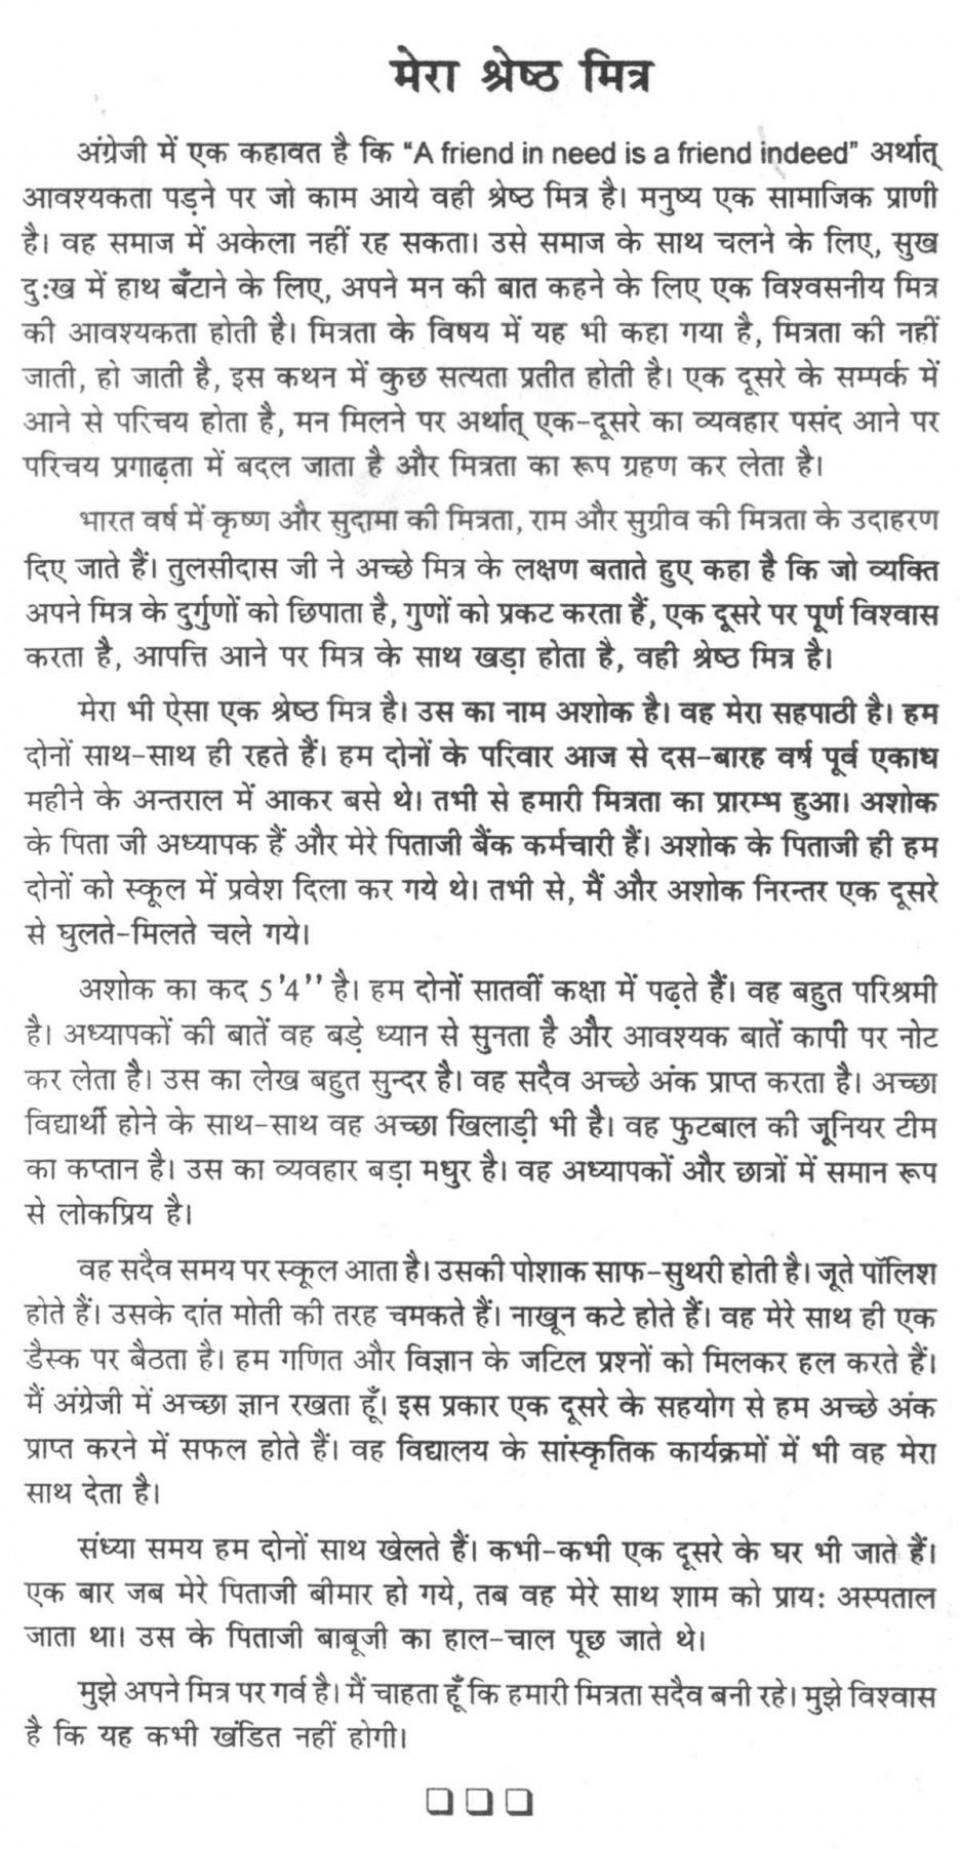 003 Essay Example Qualities Of Good Friends Friend Thumb Teacher Great Characteristics Pdf In Hindi Three Free Language Urdu Amazing A Conclusion Spm 960